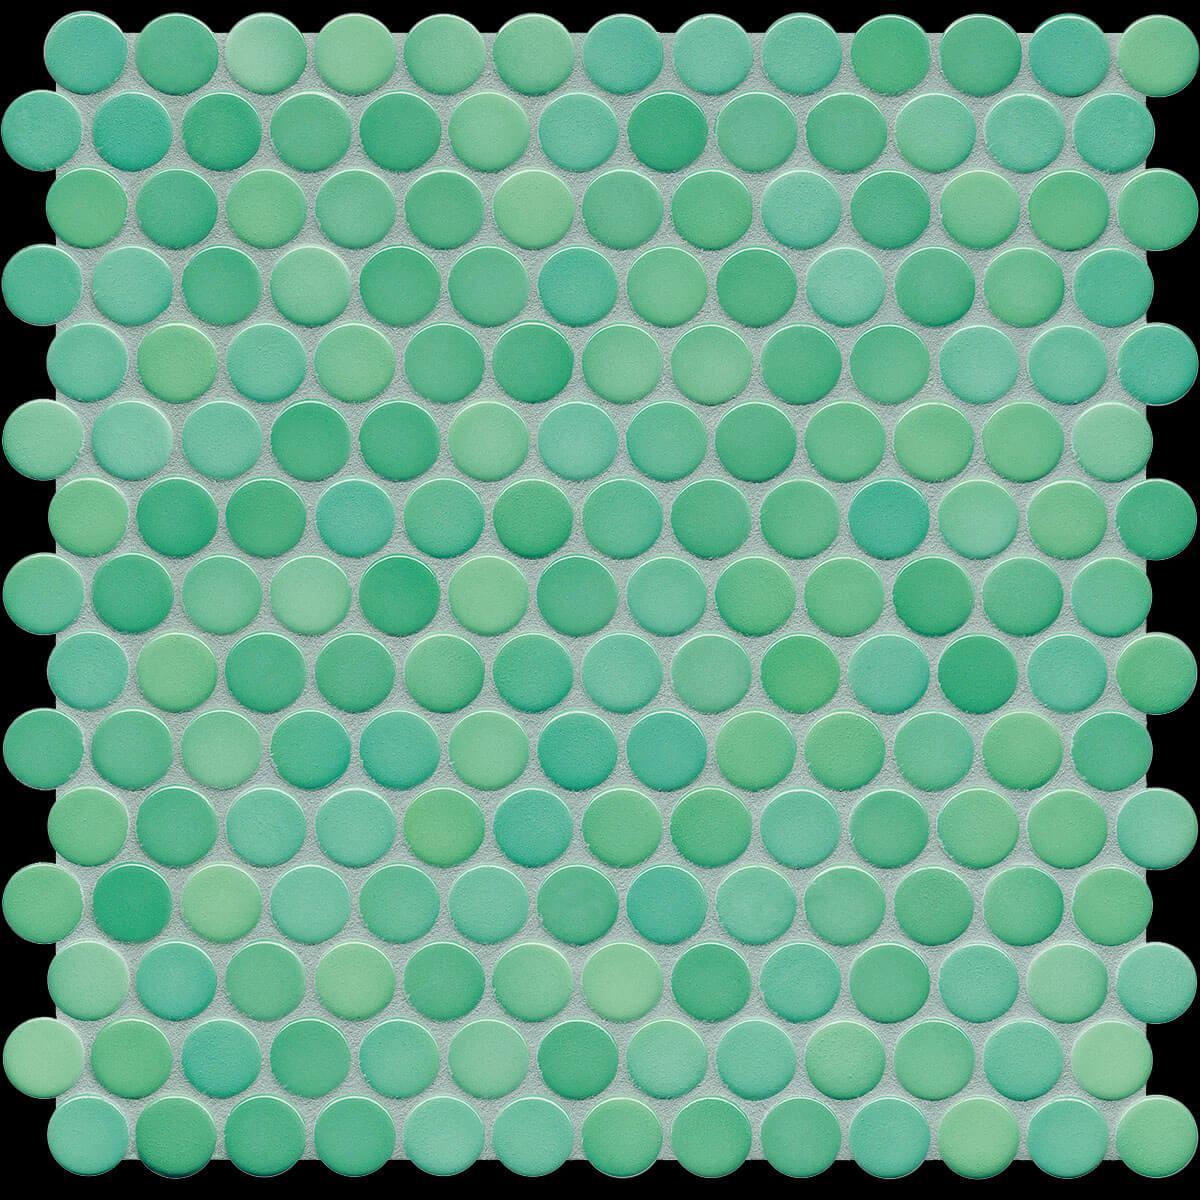 Agrob Buchtal Tiles - KLAY_Loop-_0010_40031H